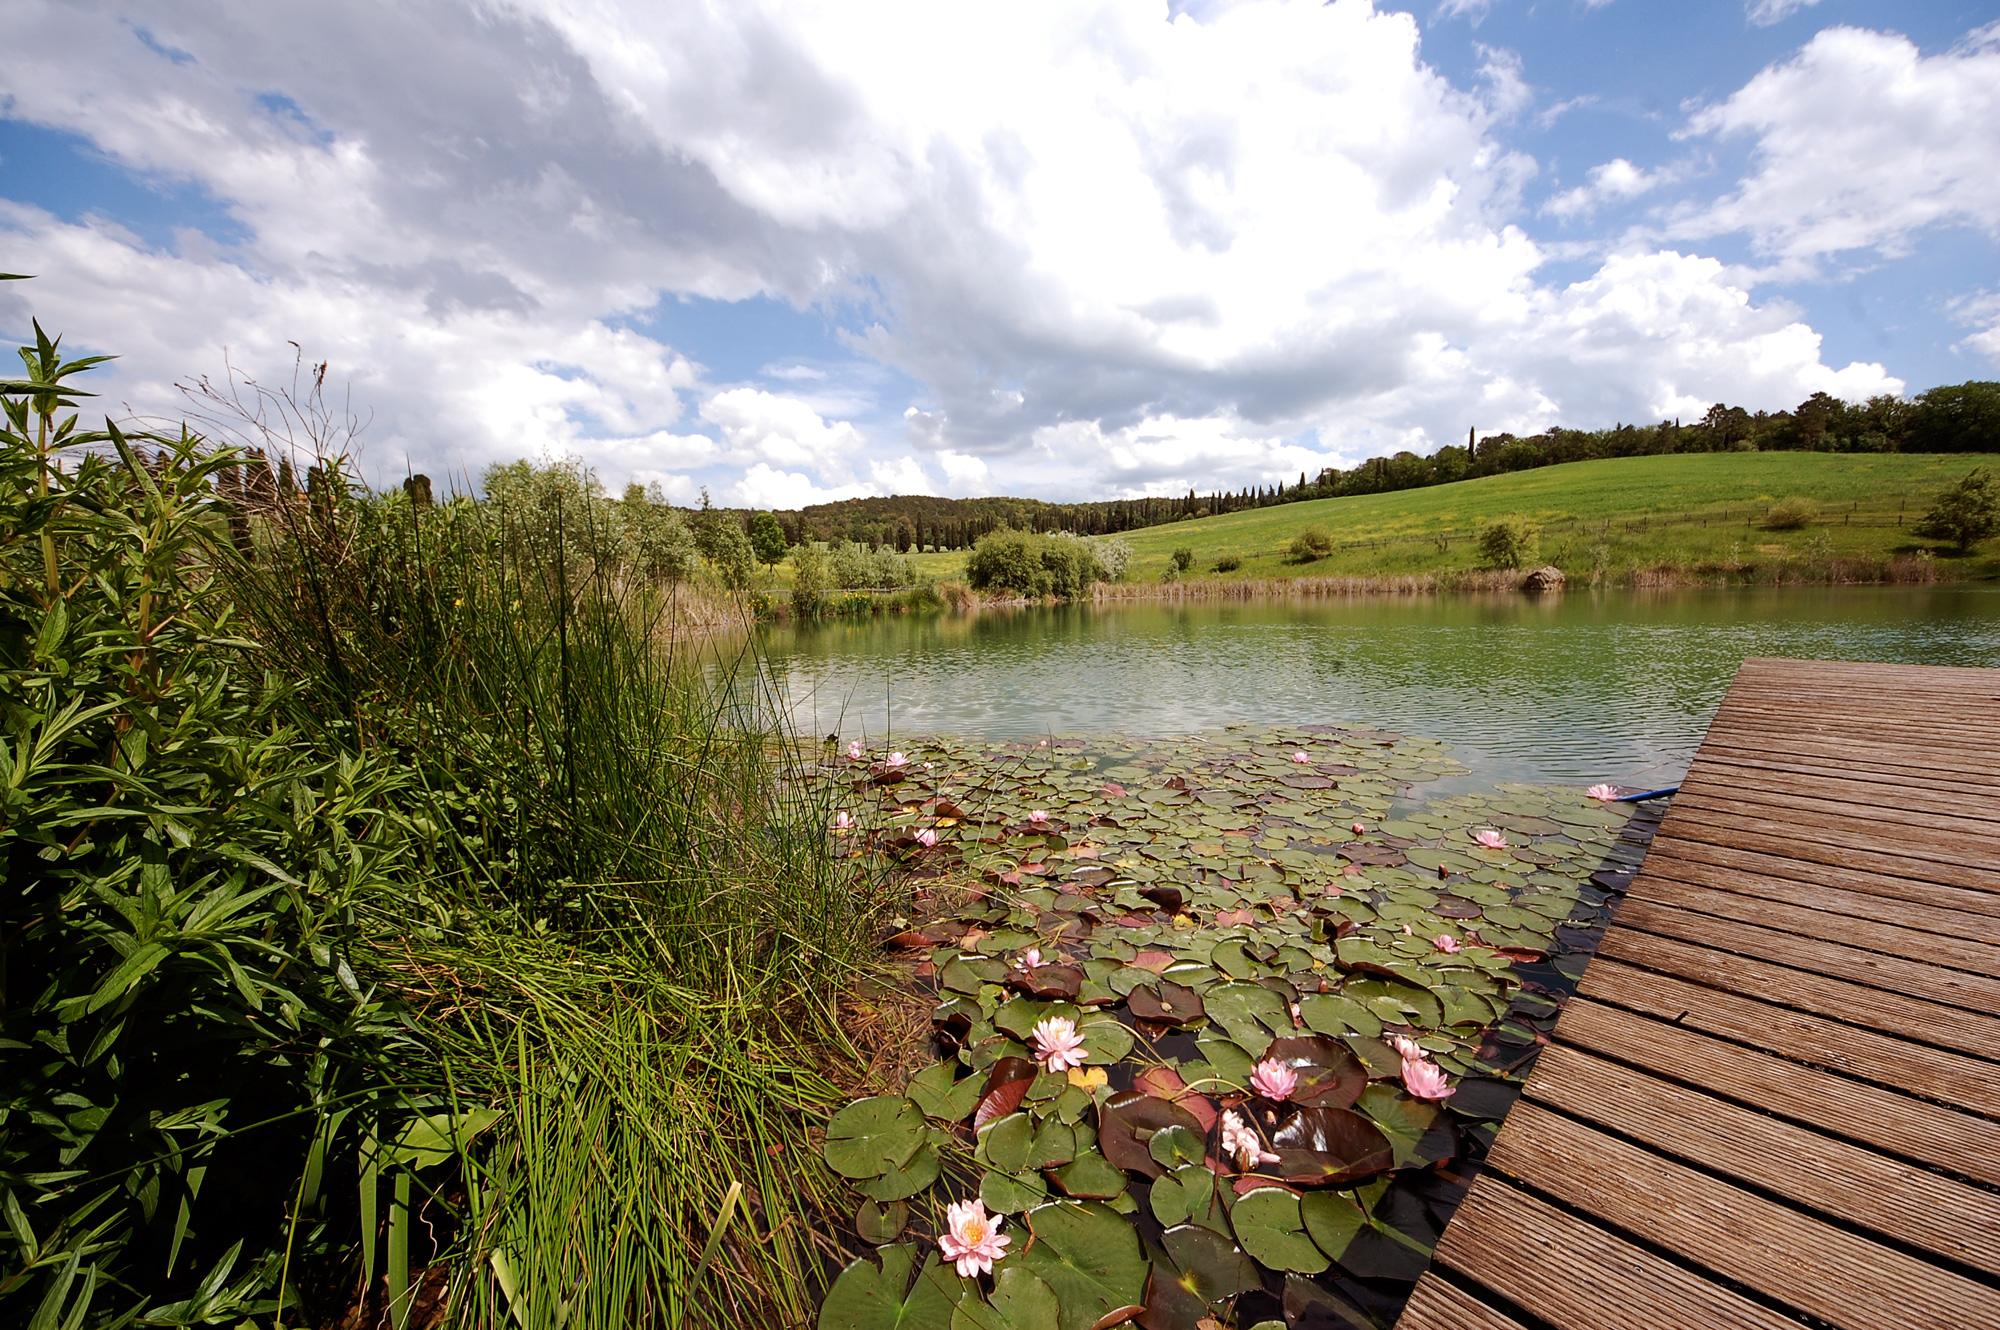 villa toscana lakes